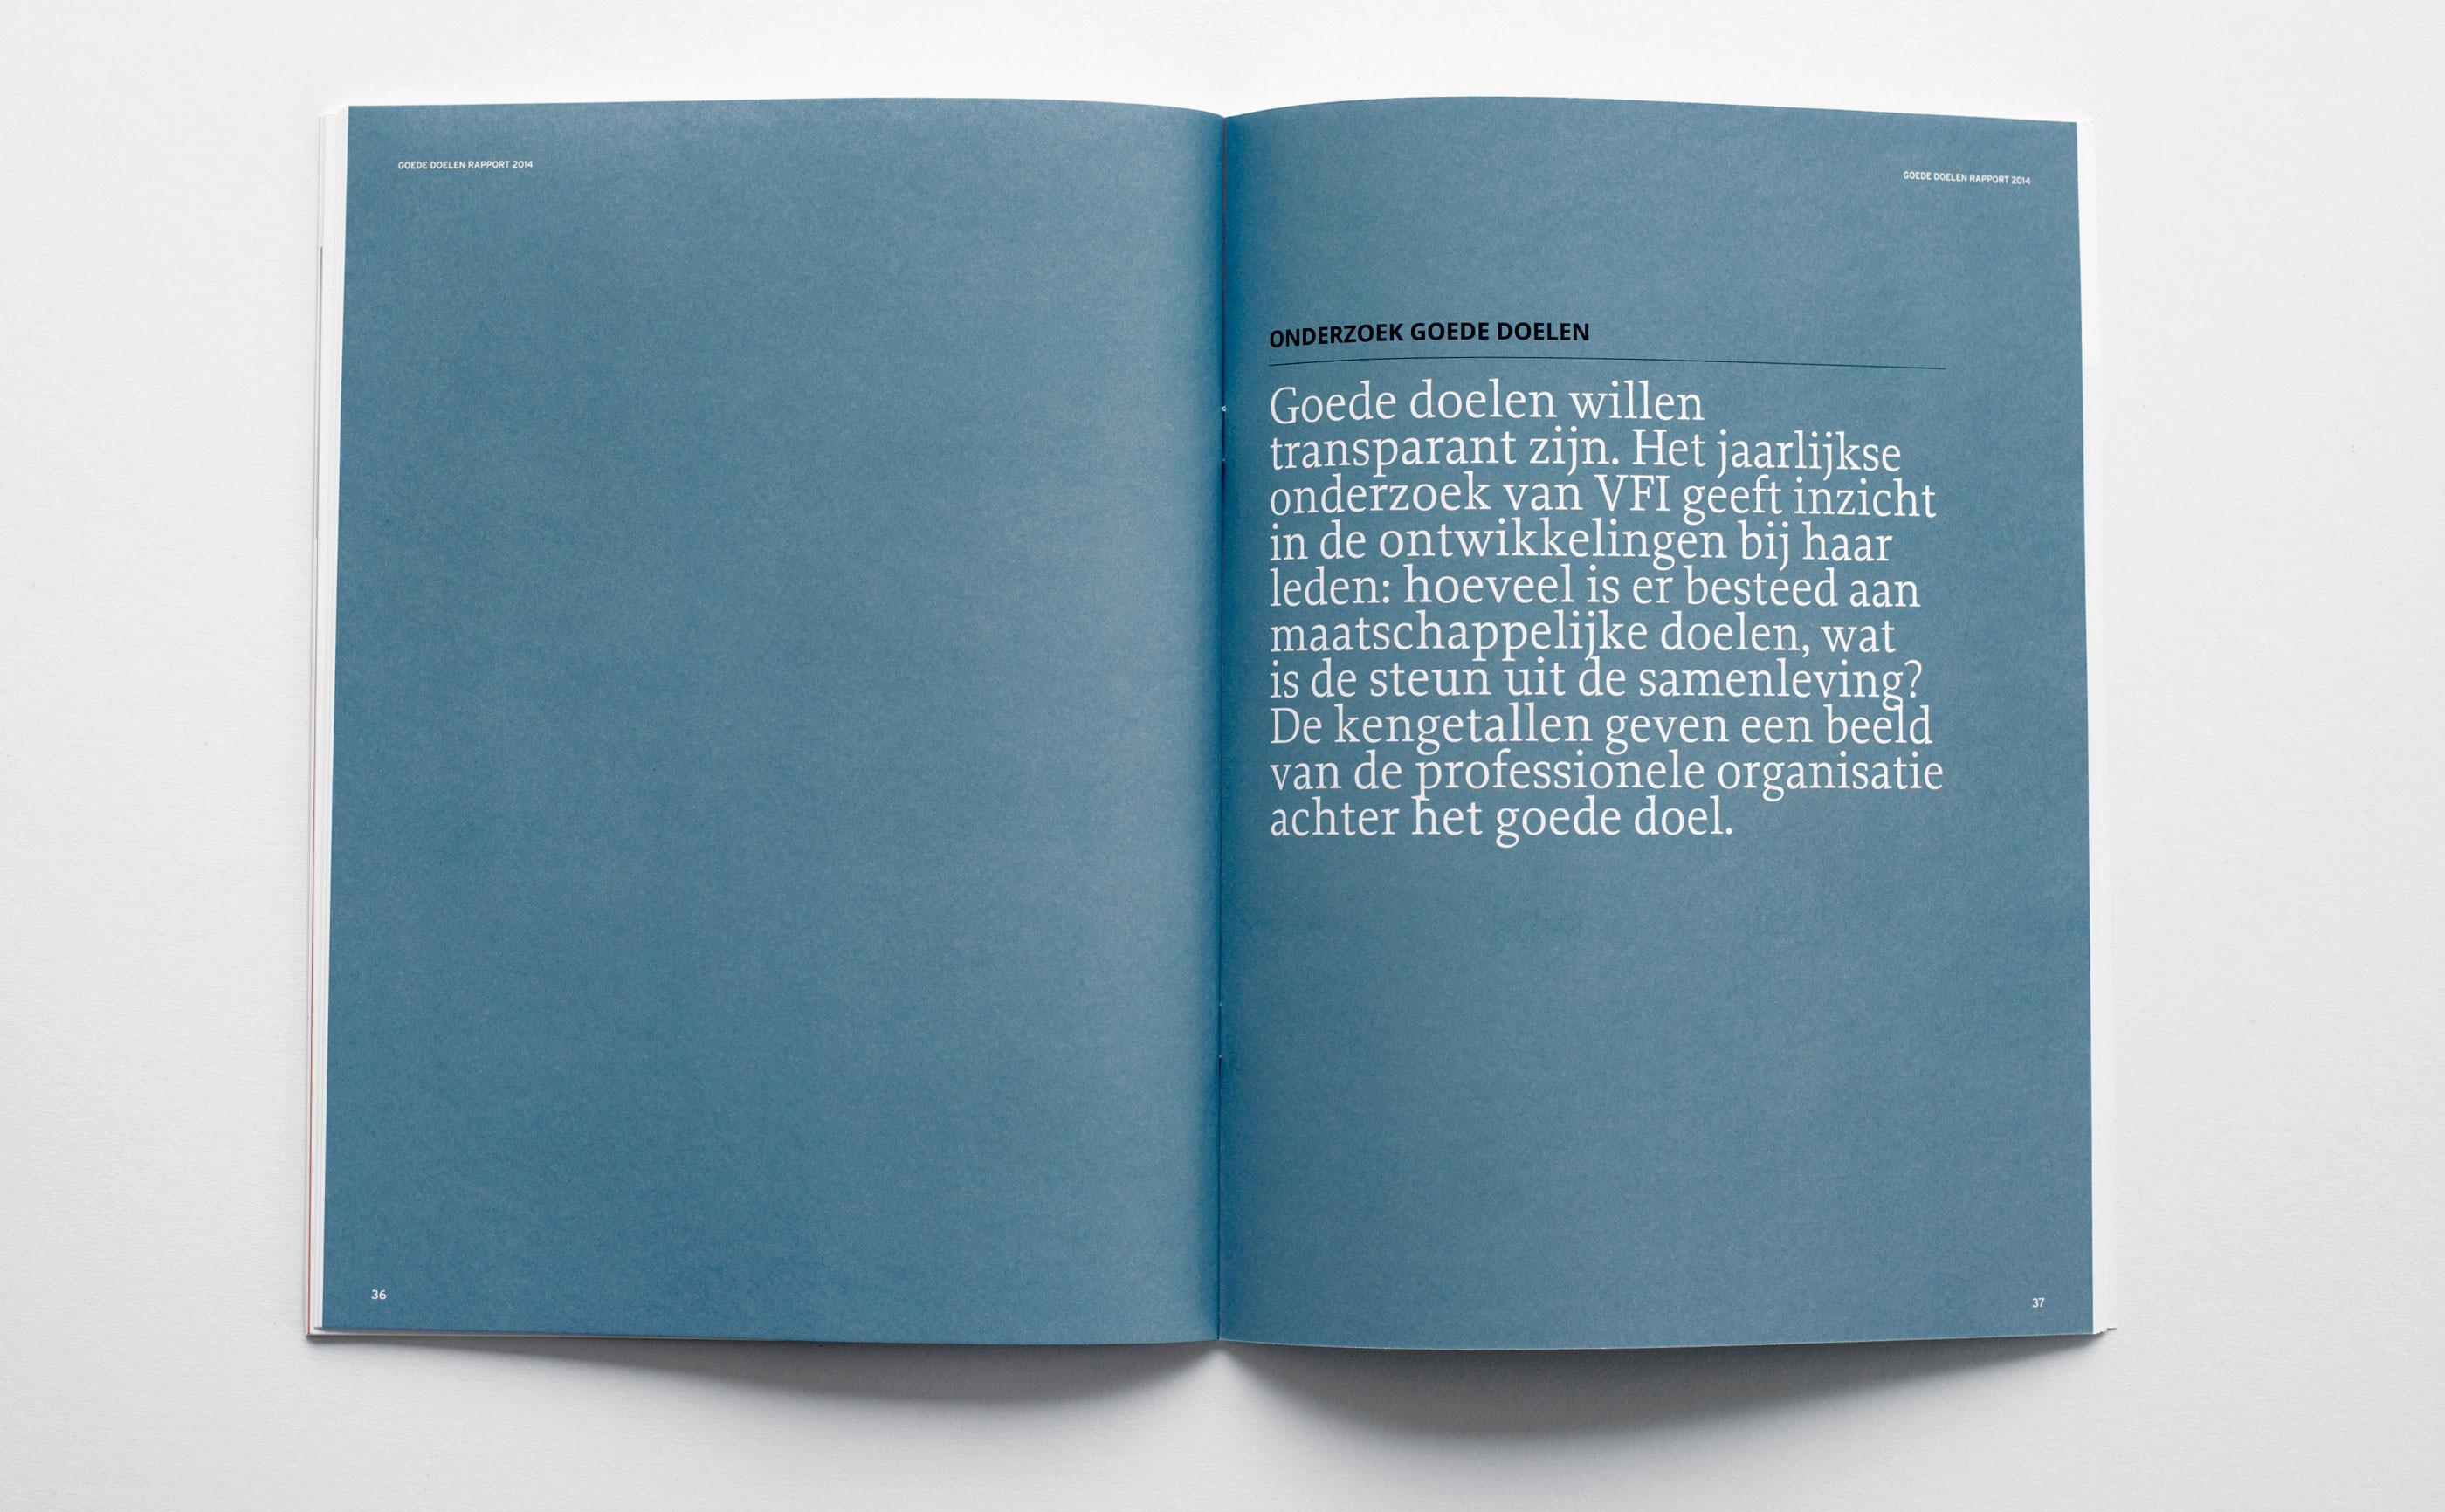 Binnenkant rapport goede doelen Nederland